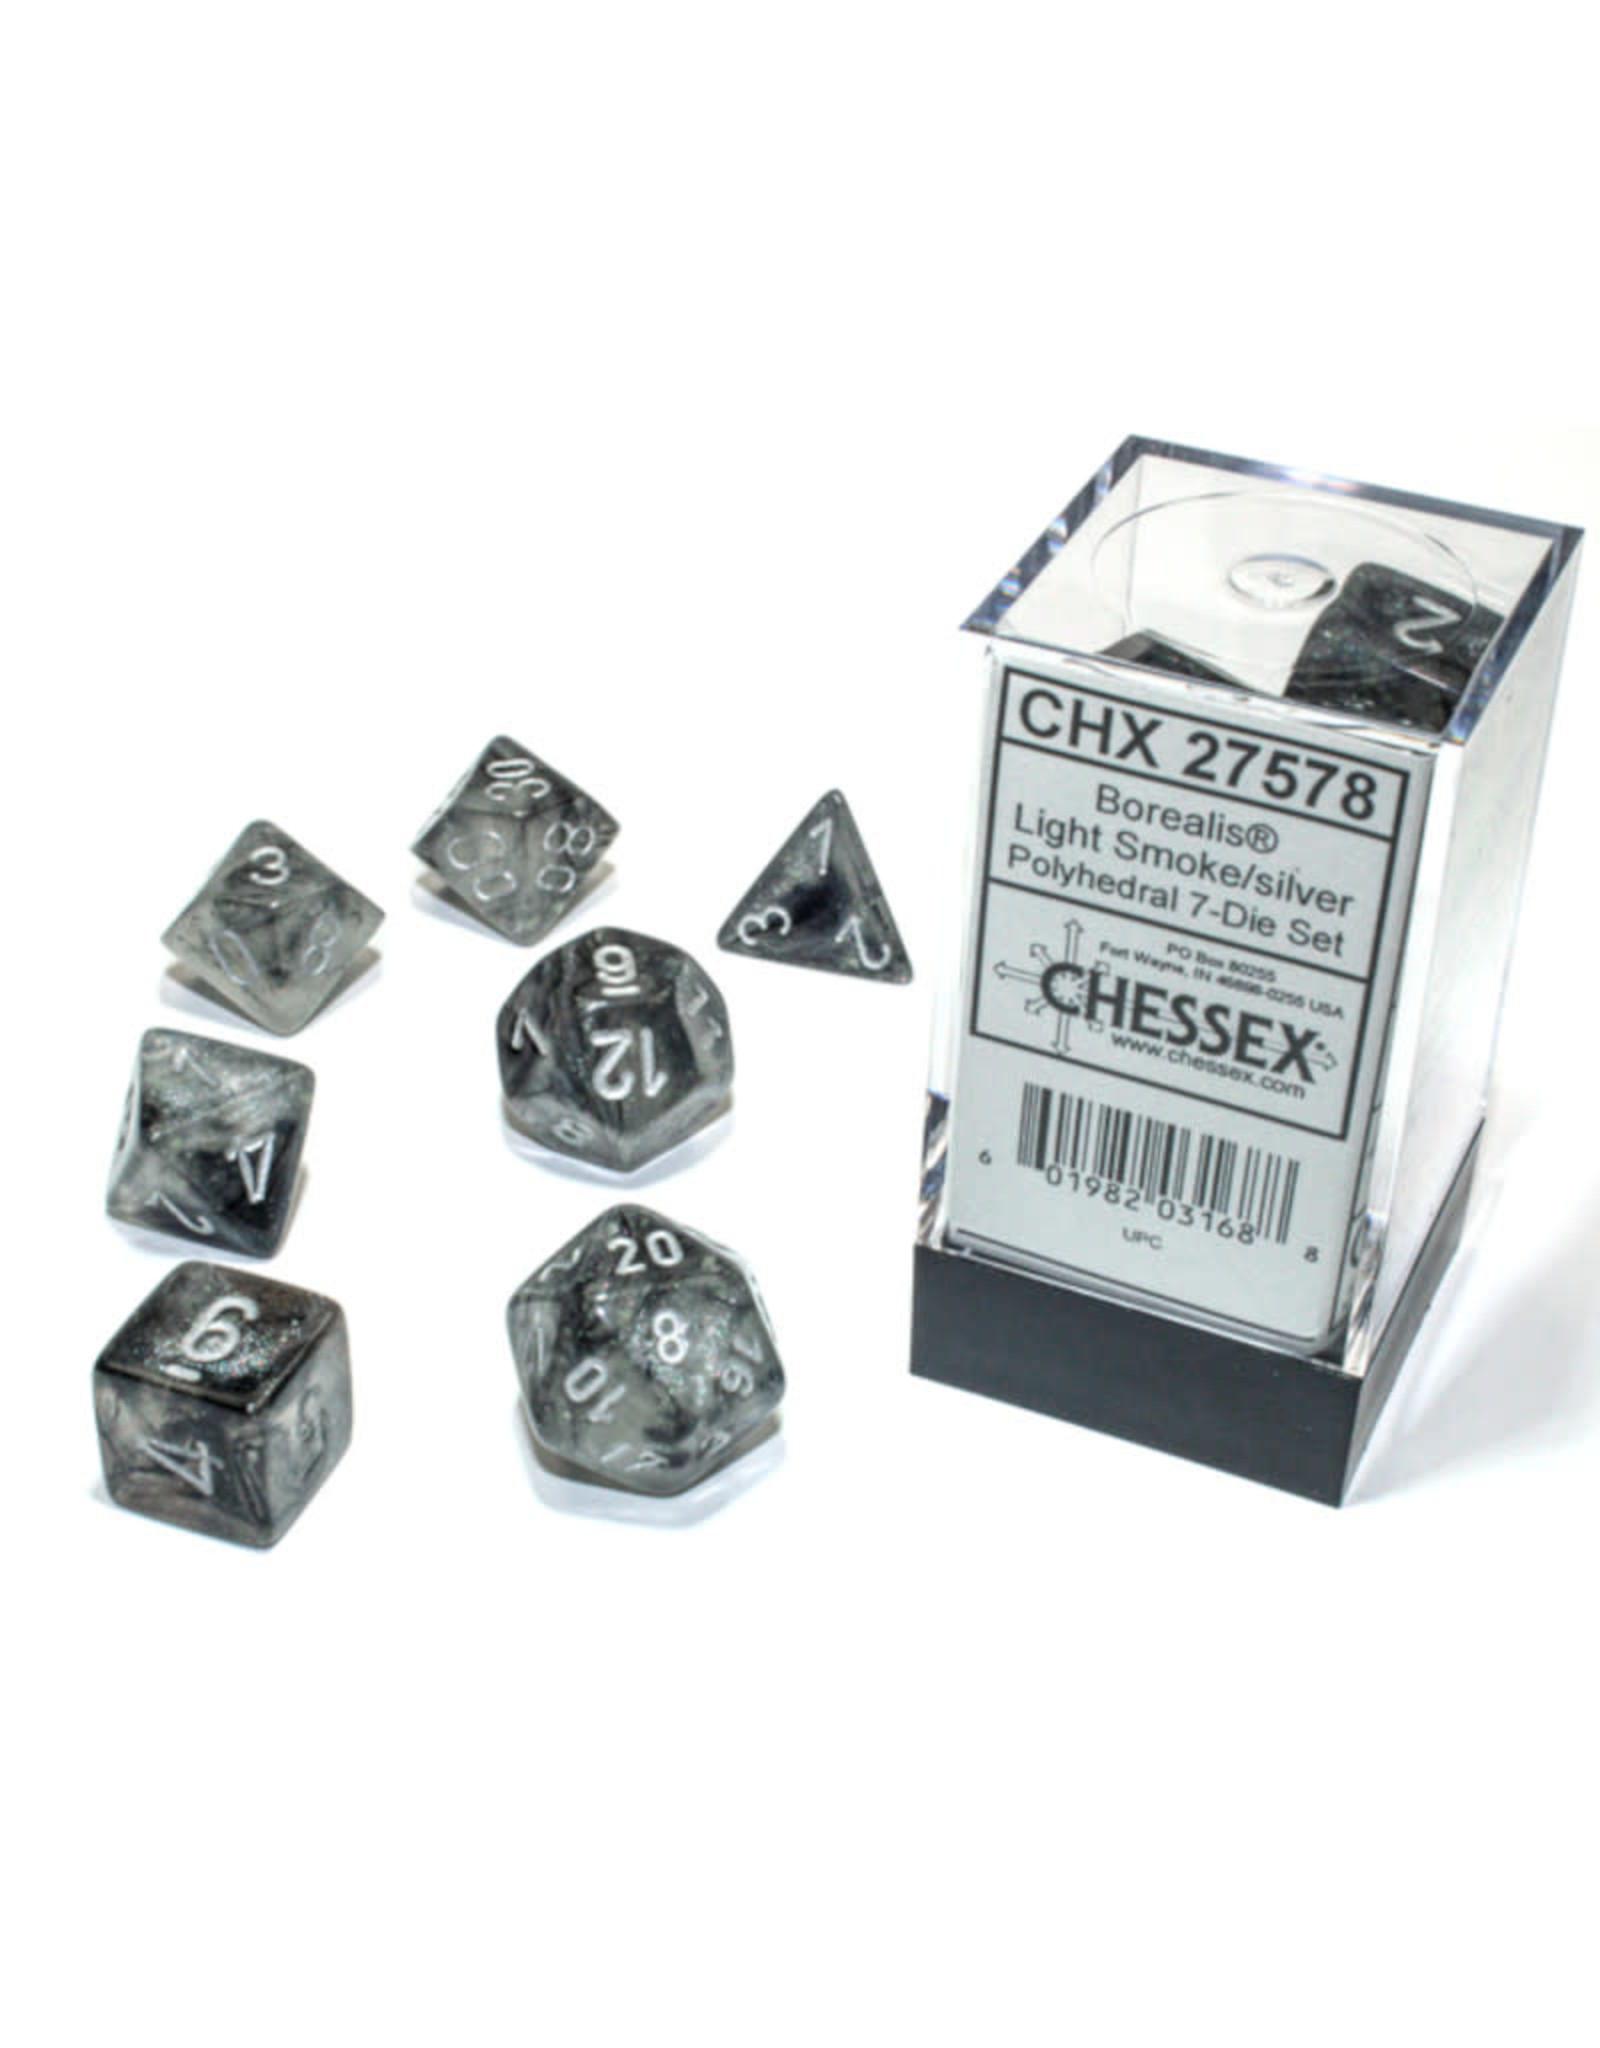 Chessex Polyhedral Dice Set: Borealis Light Smoke Set (7)